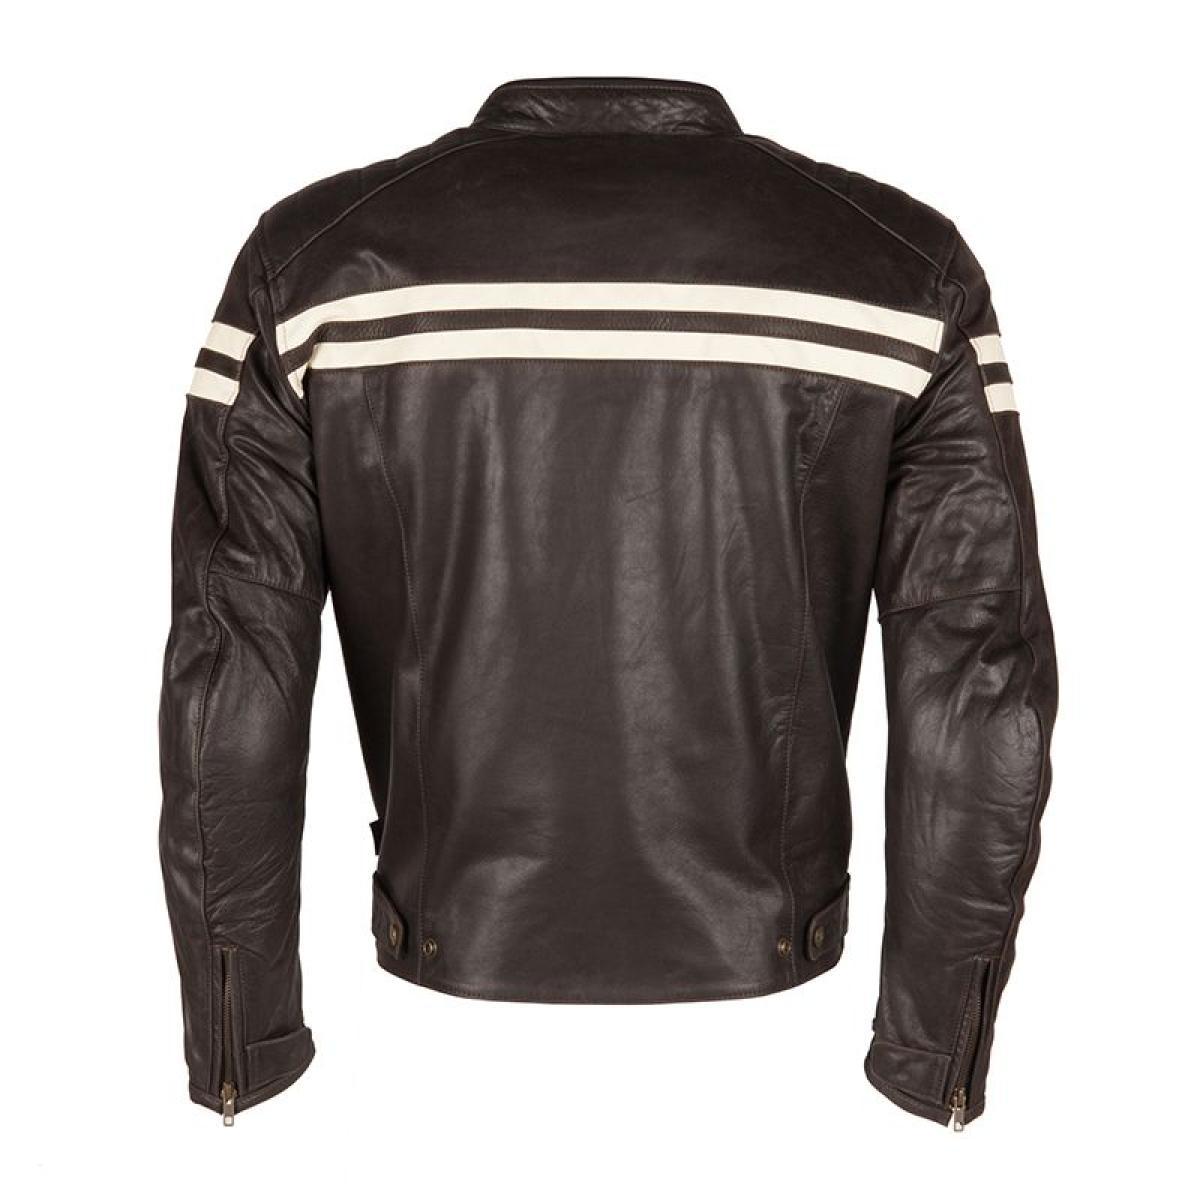 blouson cuir moto segura retro marron beige. Black Bedroom Furniture Sets. Home Design Ideas